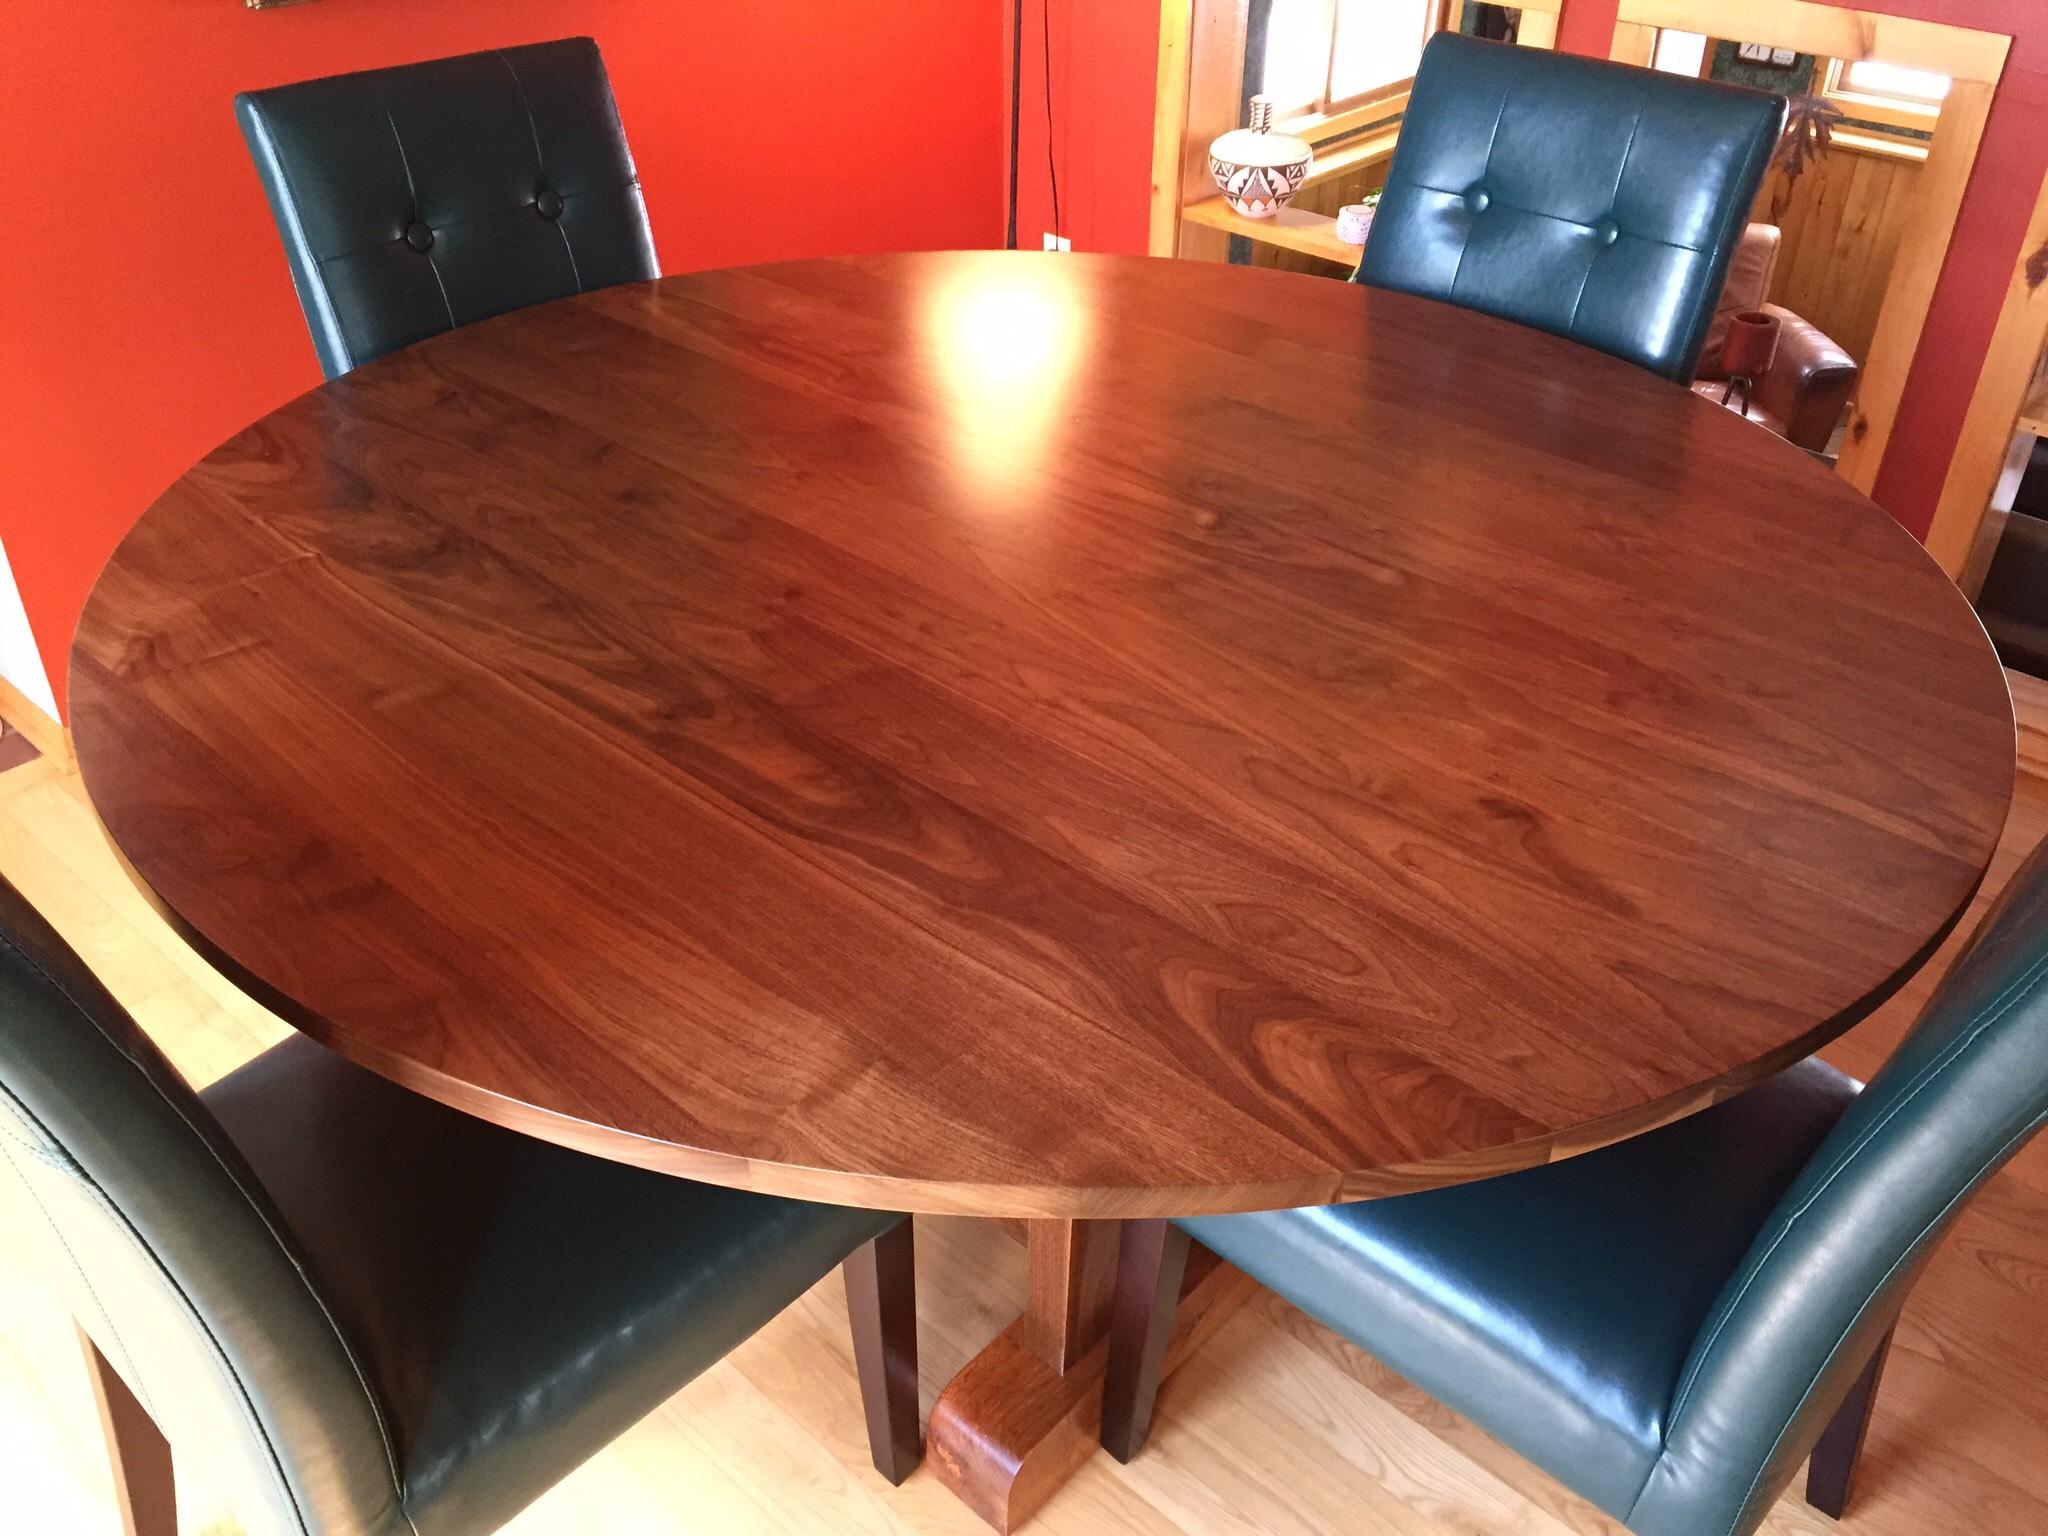 Wood, Walnut and Oak Trestle Frame Dining Room Table, Bromann Home, Rib Lake, WI